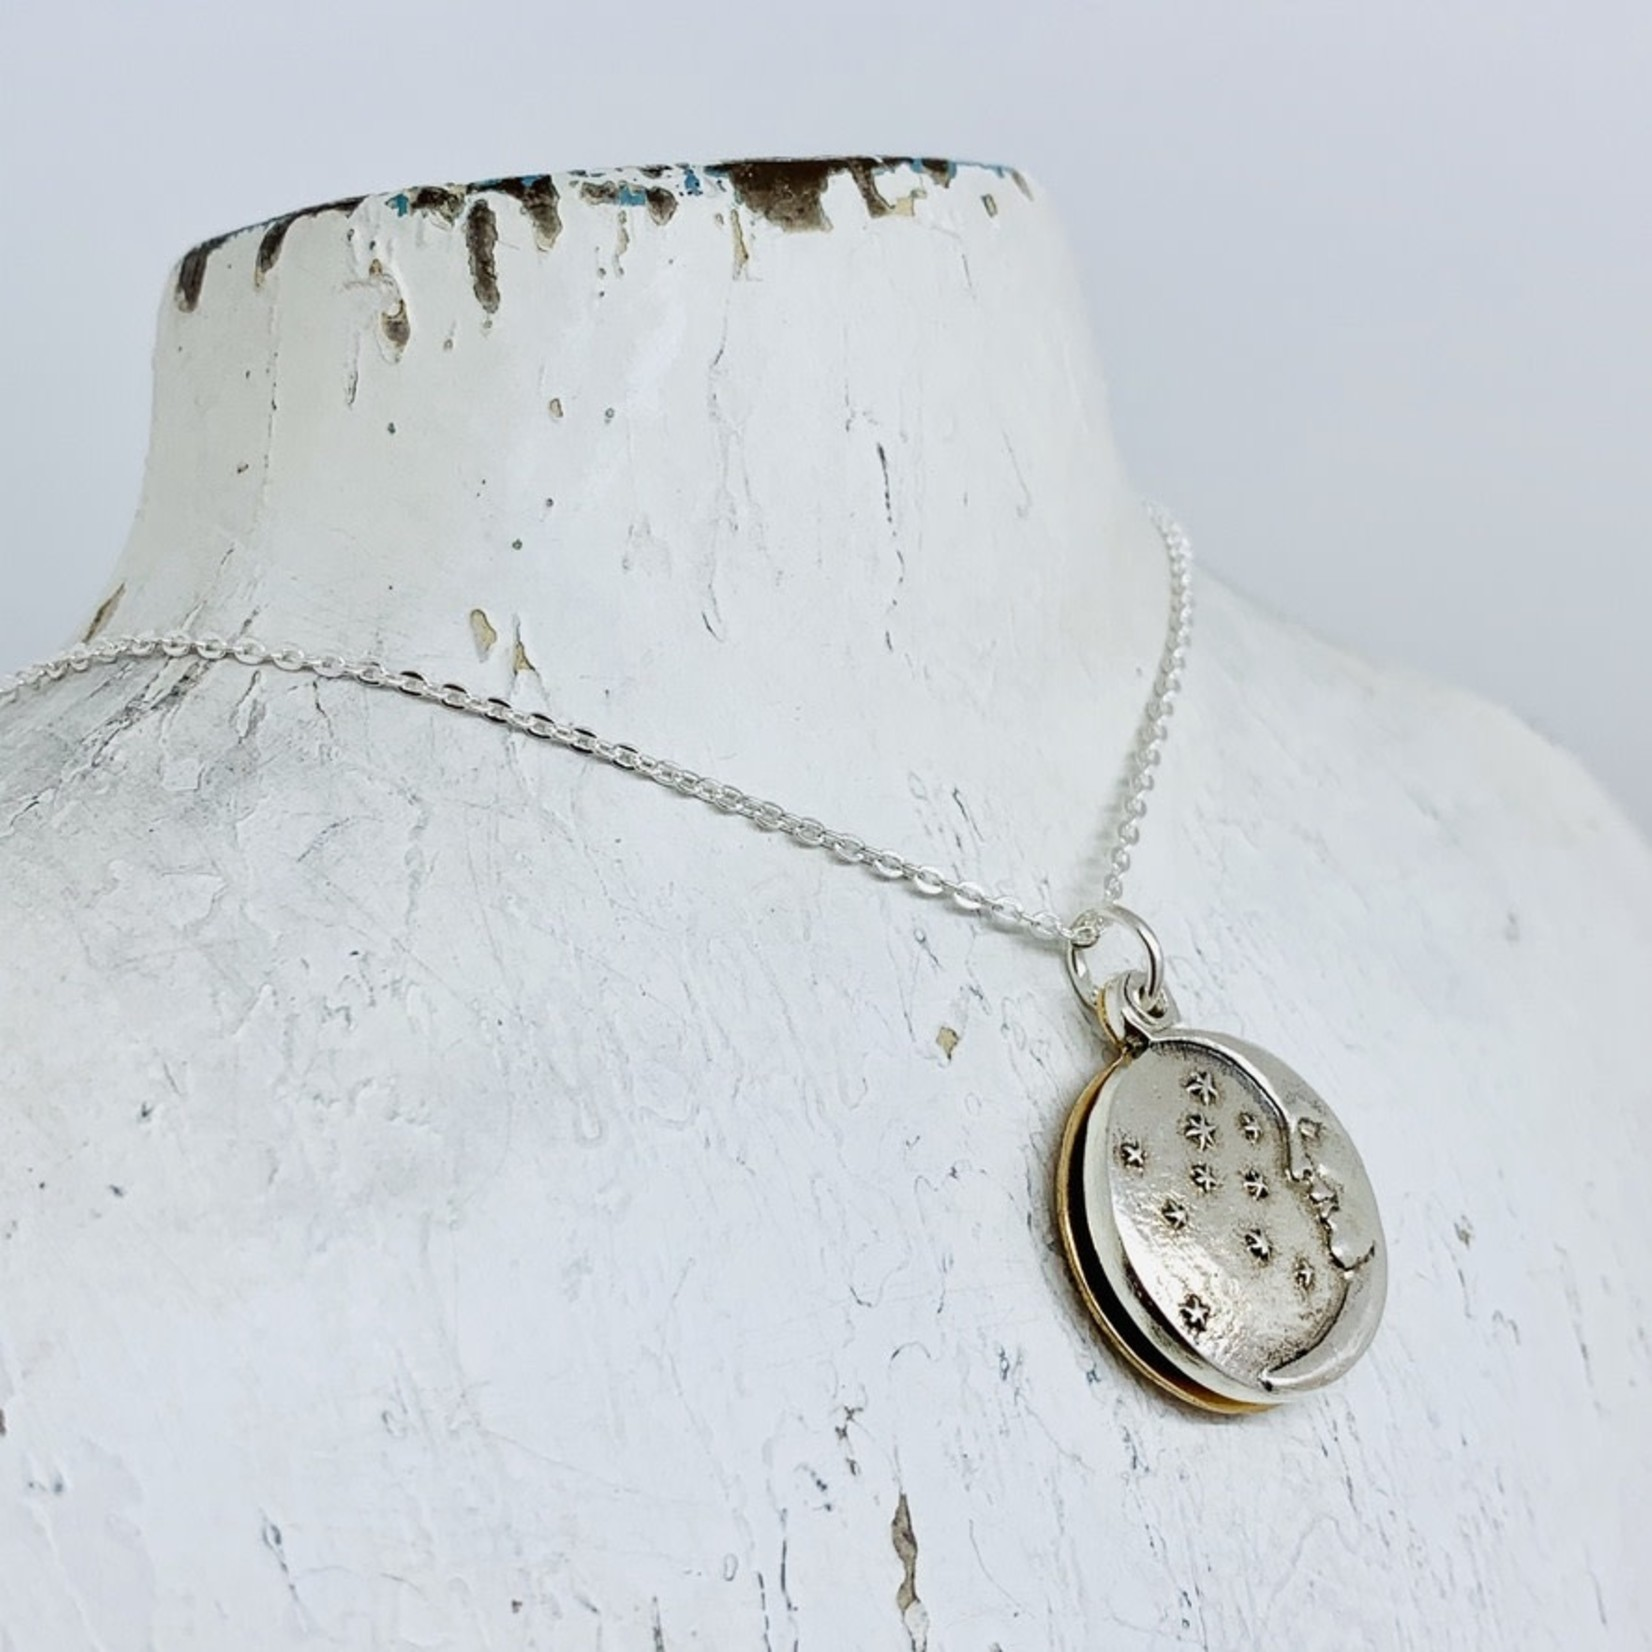 Silver and Bronze Moon & Sun Sliding Locket